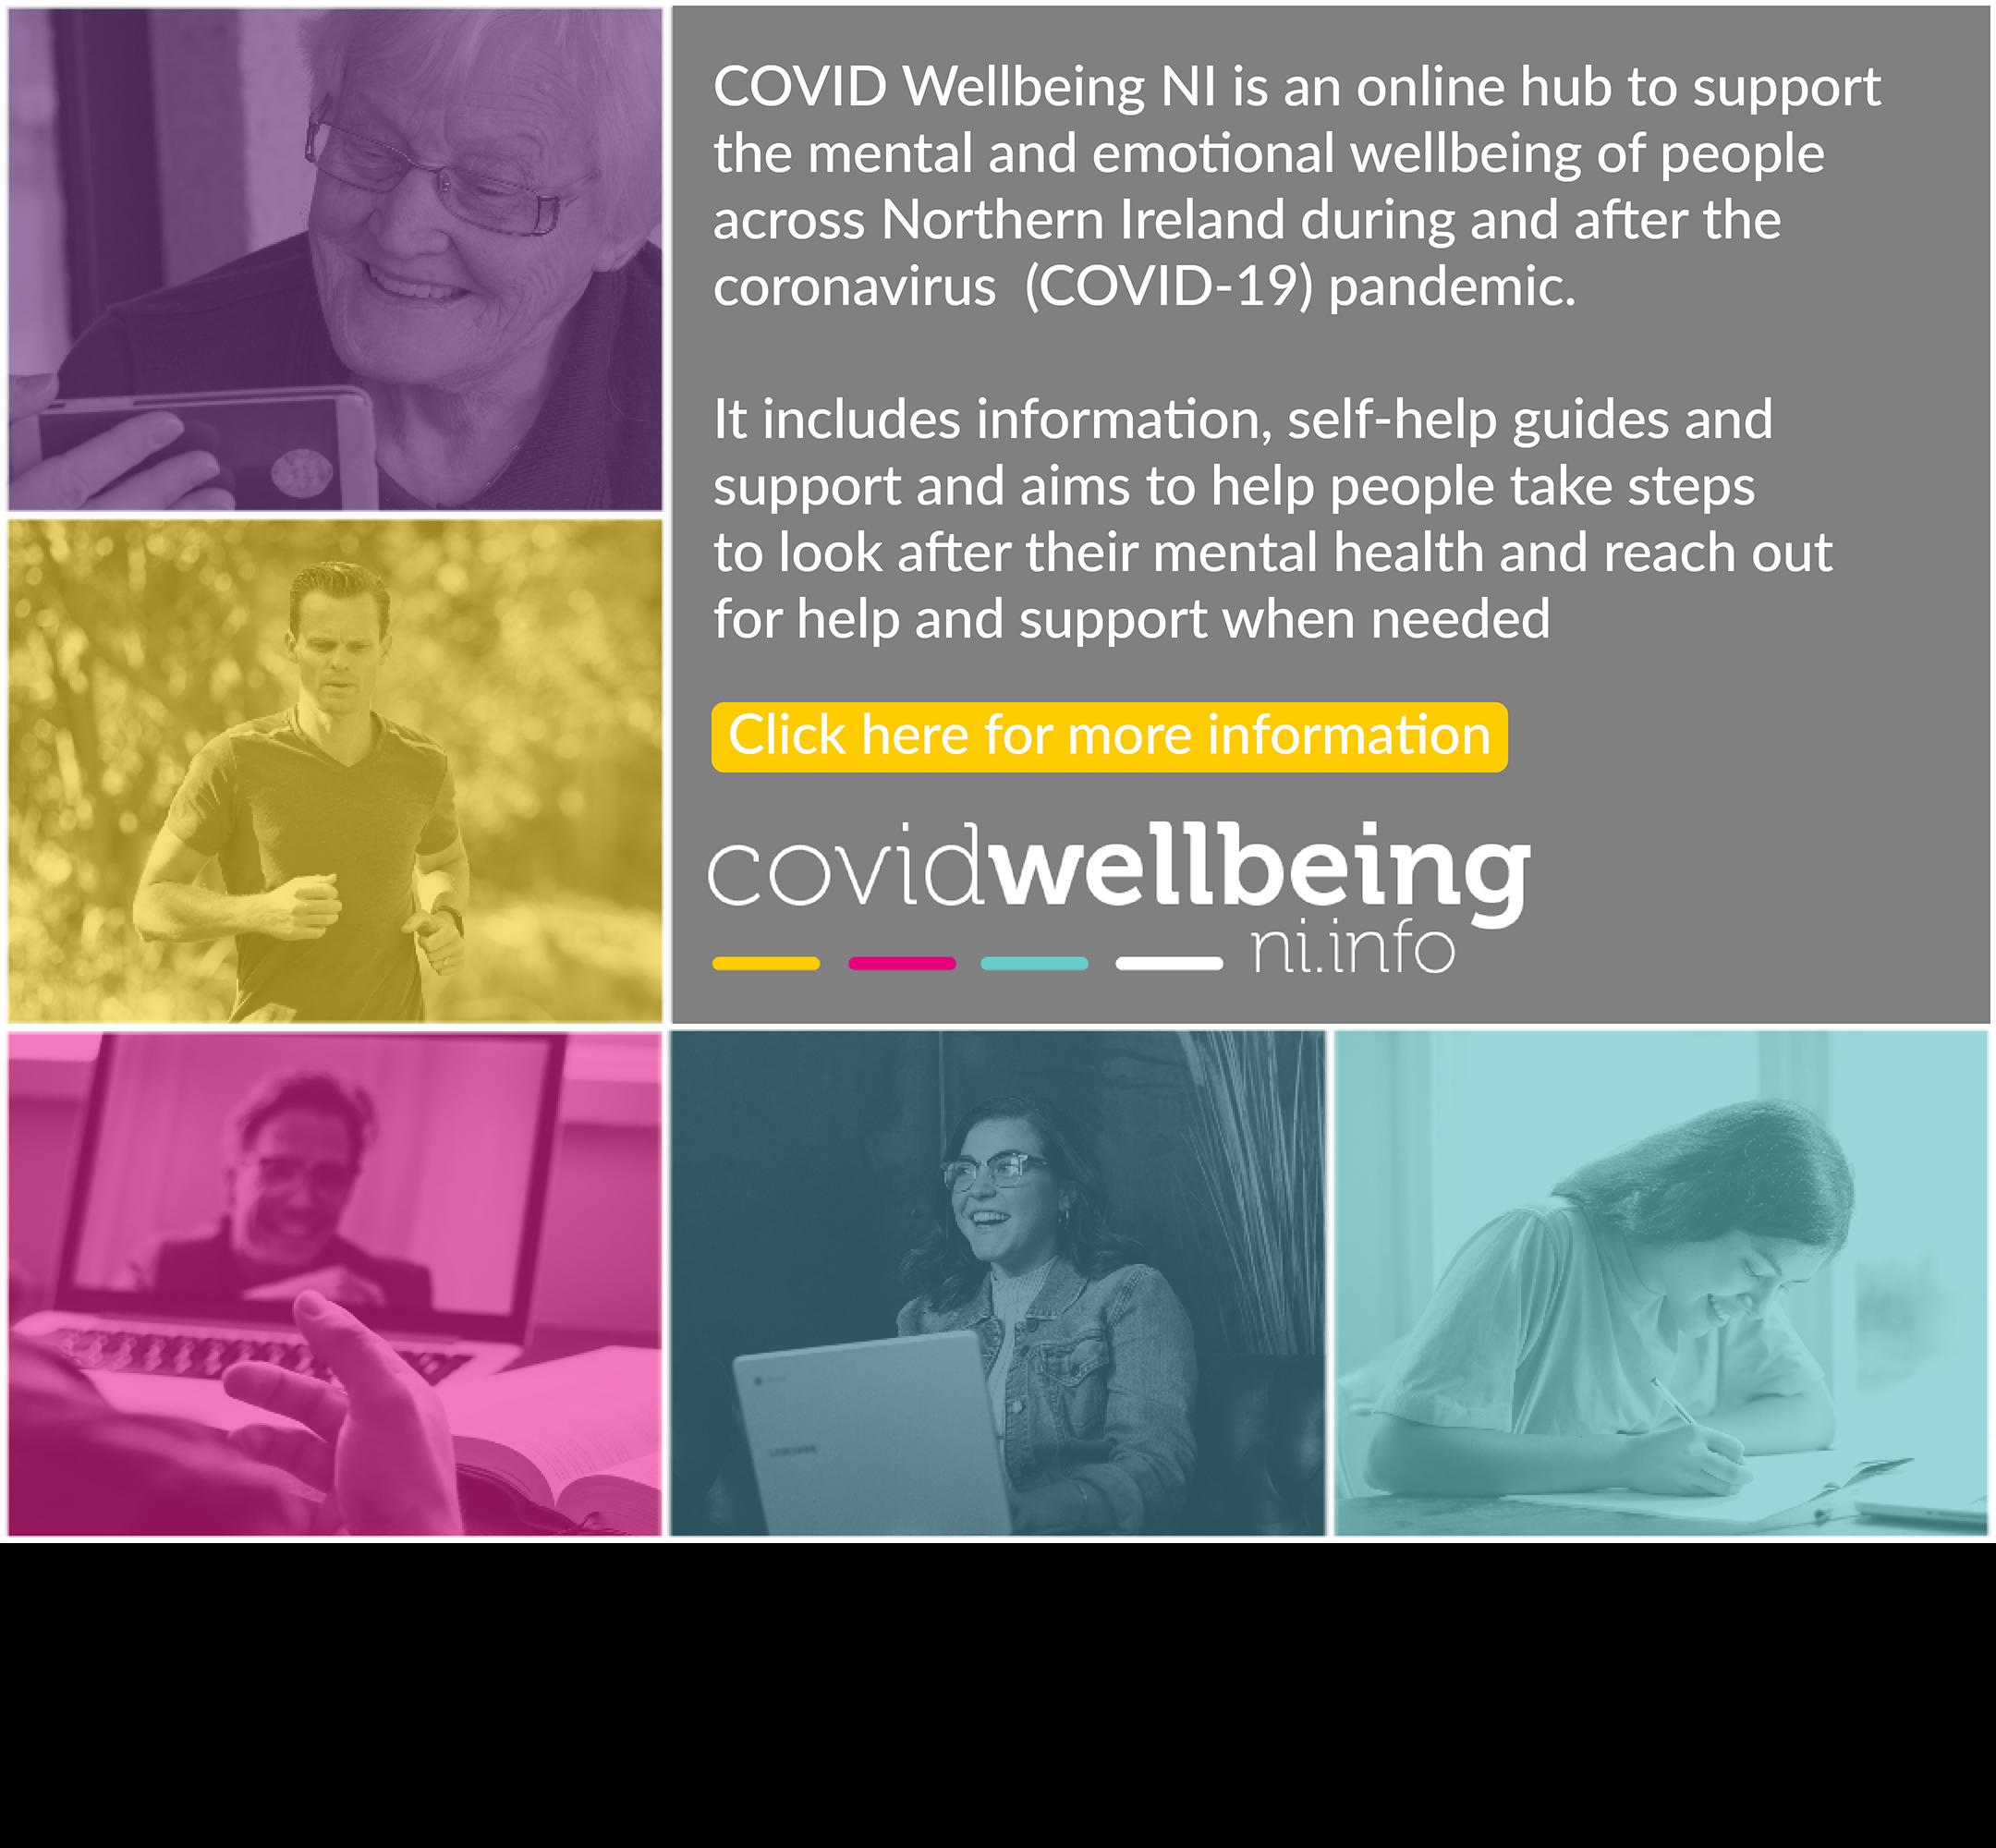 Covid Wellbeing NI